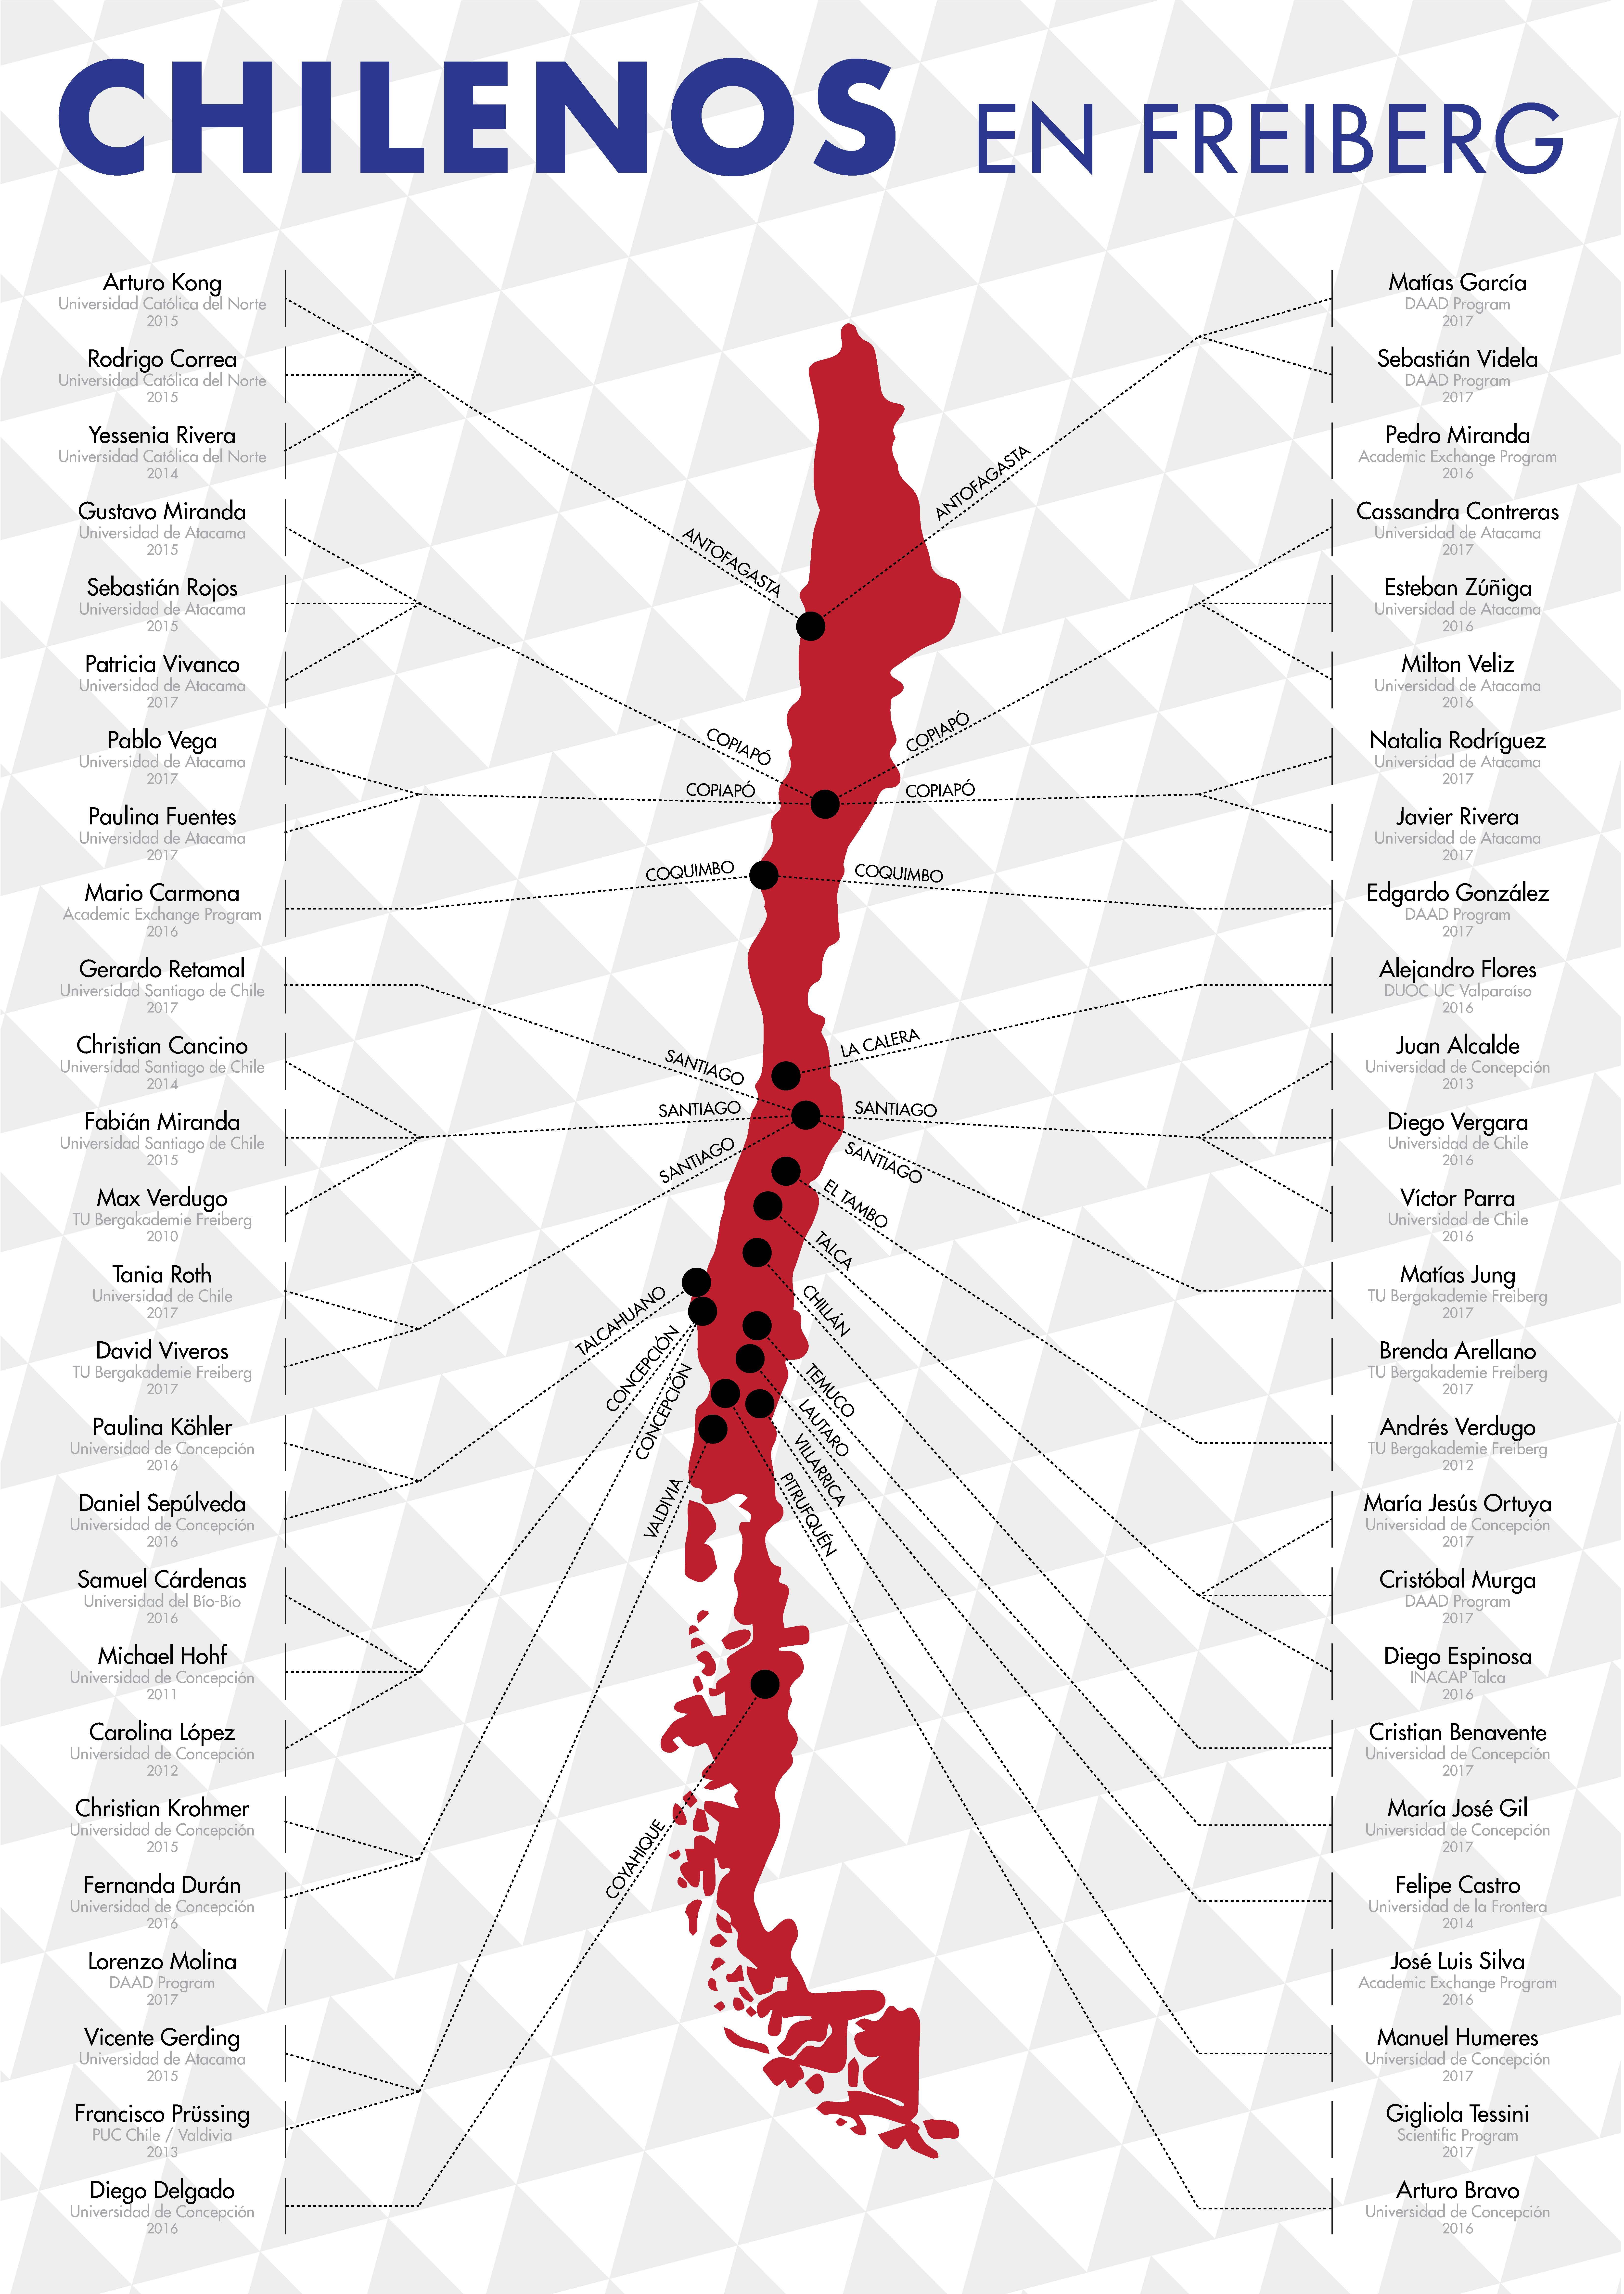 chilenos en FG 2017